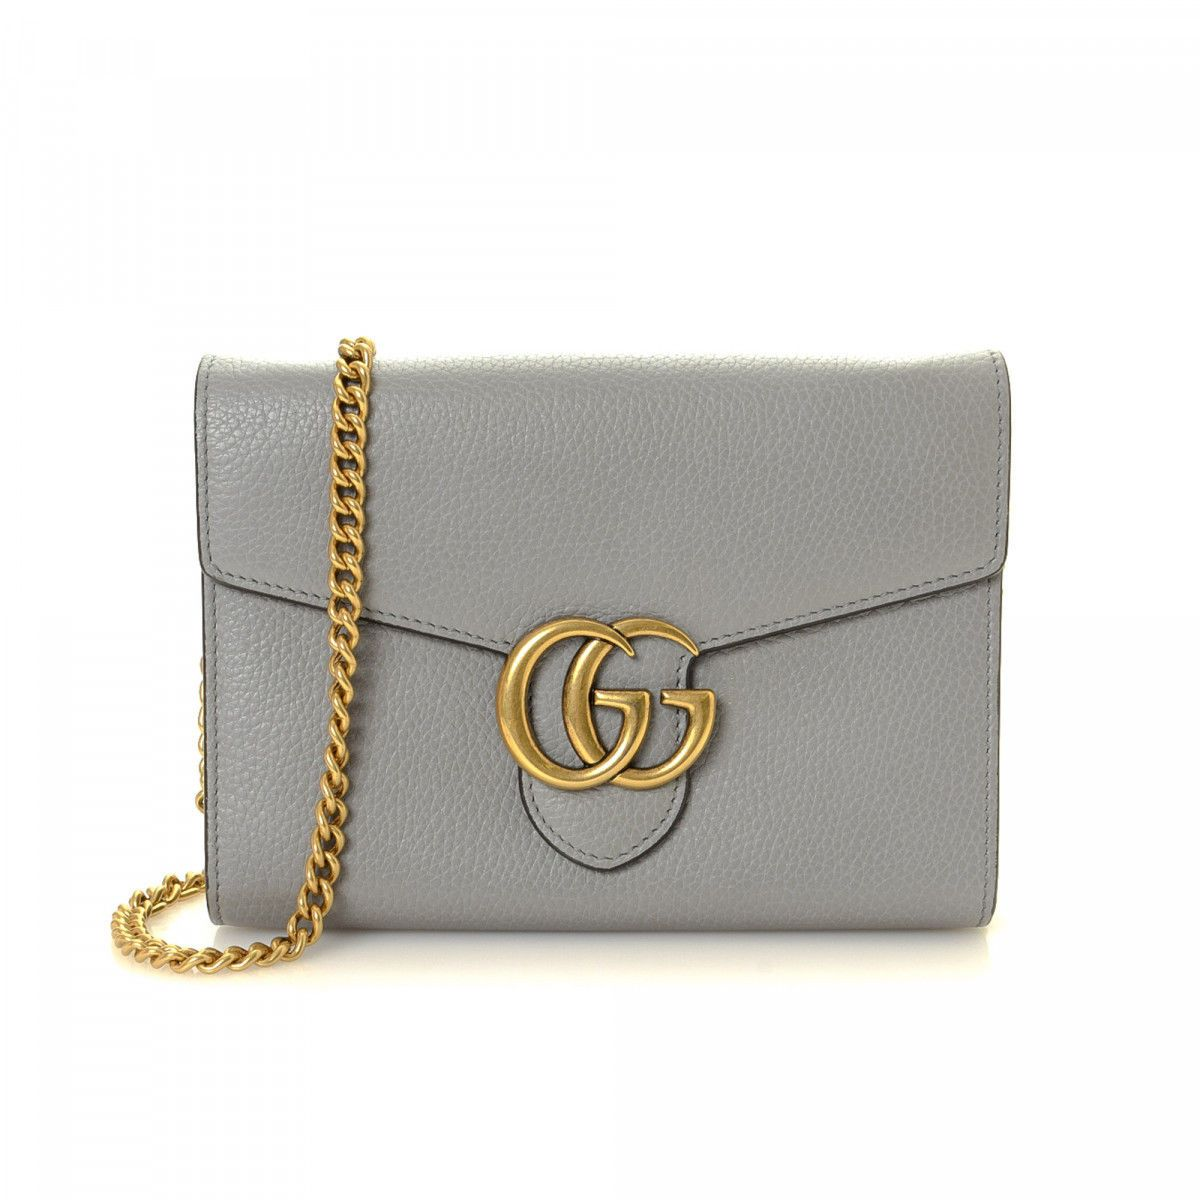 6dea45c1ebf Gucci GG Marmont Chain Wallet Bag Calf - LXRandCo - Pre-Owned Luxury Vintage